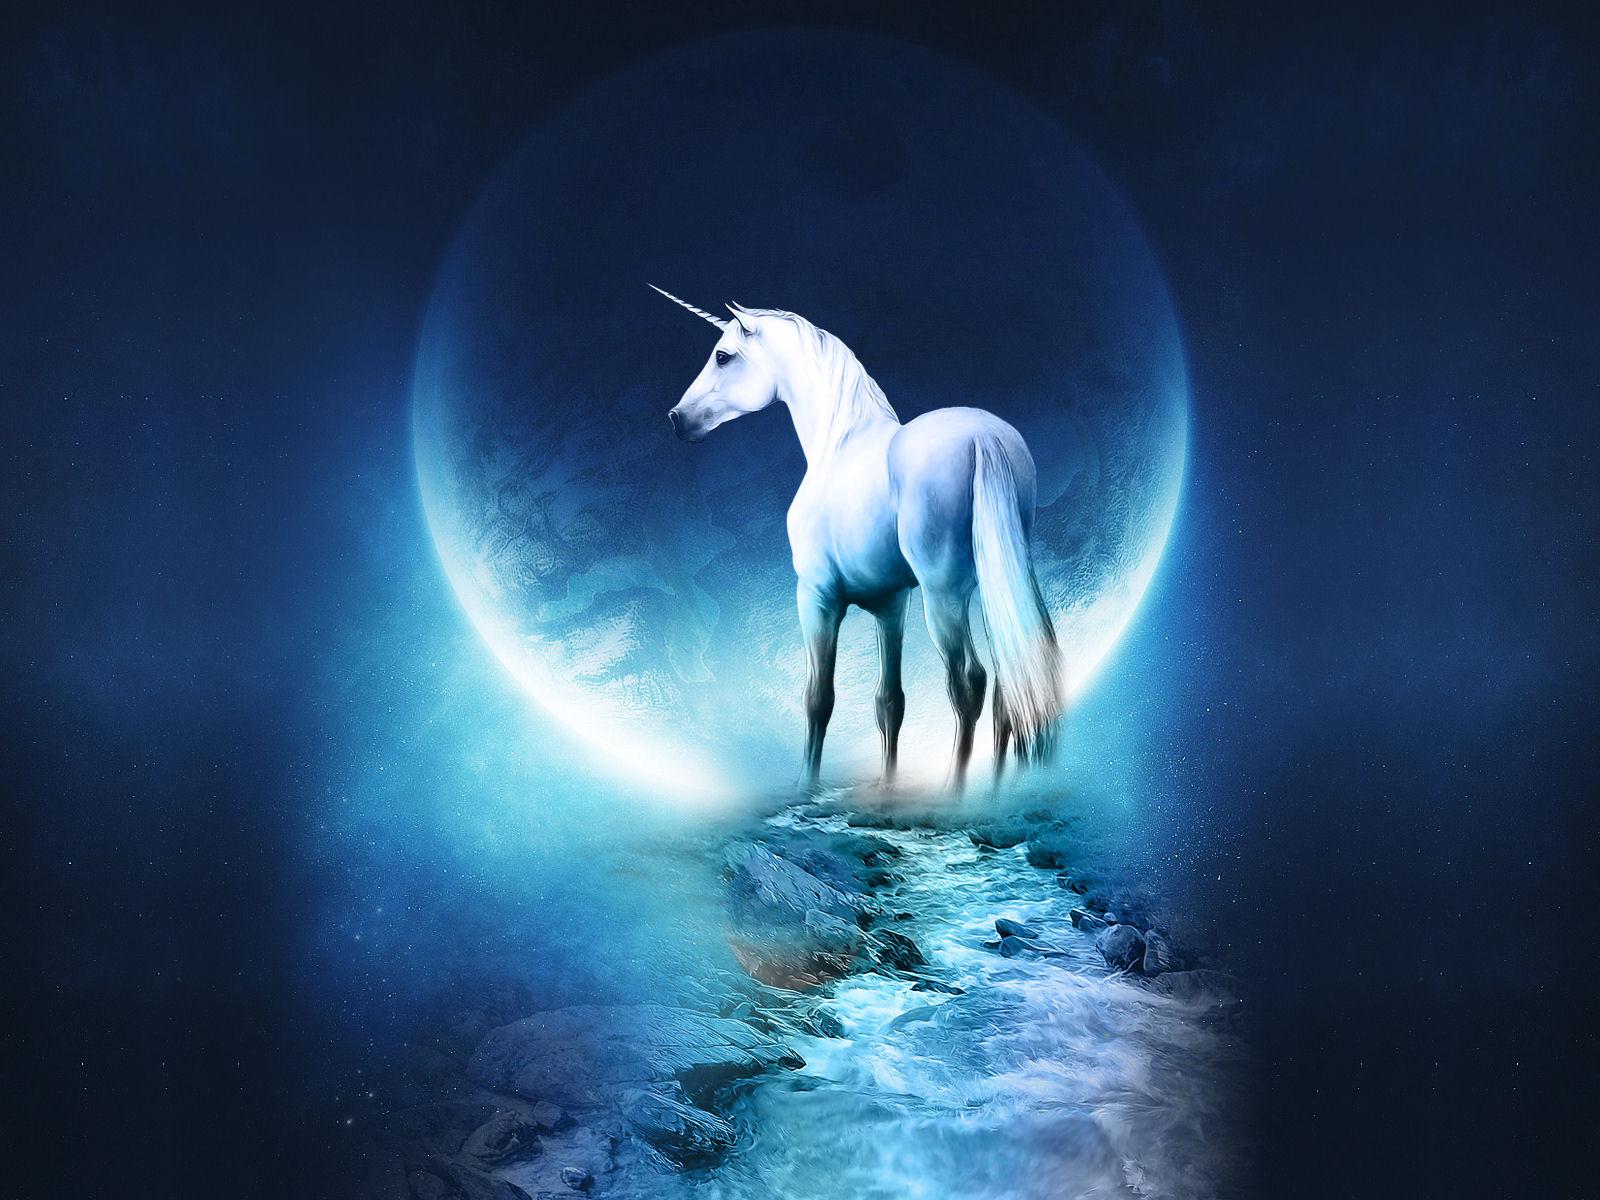 http://3.bp.blogspot.com/_ChezRBuCnGs/TRHp4pQB4xI/AAAAAAAAAHA/qS5YzO_sp4E/s1600/Fantasy%2Bspace-03.jpg